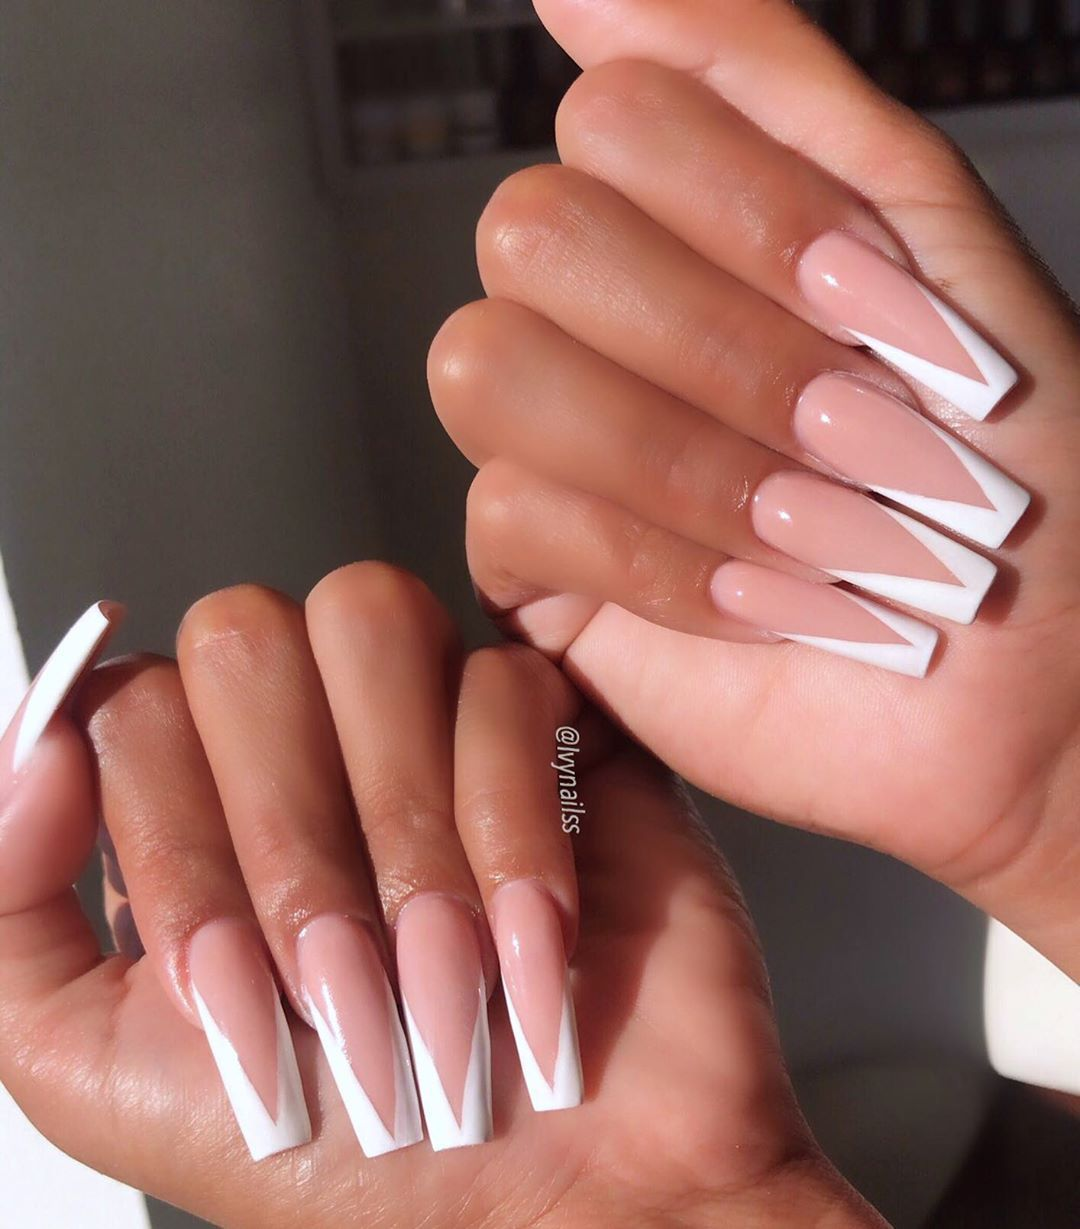 V French So Classy For Mrpapagi0rgi0 V In 2020 White Tip Acrylic Nails Long Square Acrylic Nails Square Acrylic Nails